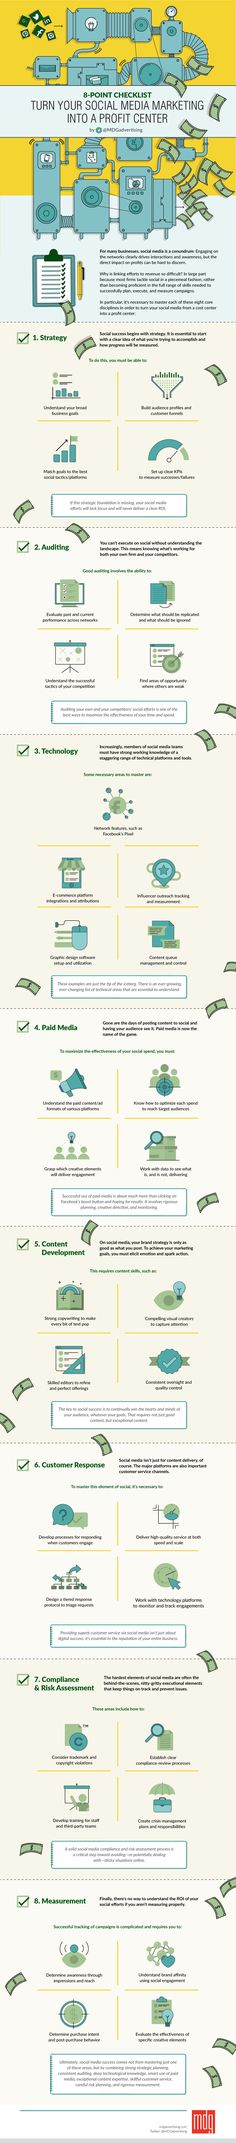 8-Point Checklist: Turn Your Social Media Marketing Into a Profit Center #Infographic #Marketing #SocialMedia